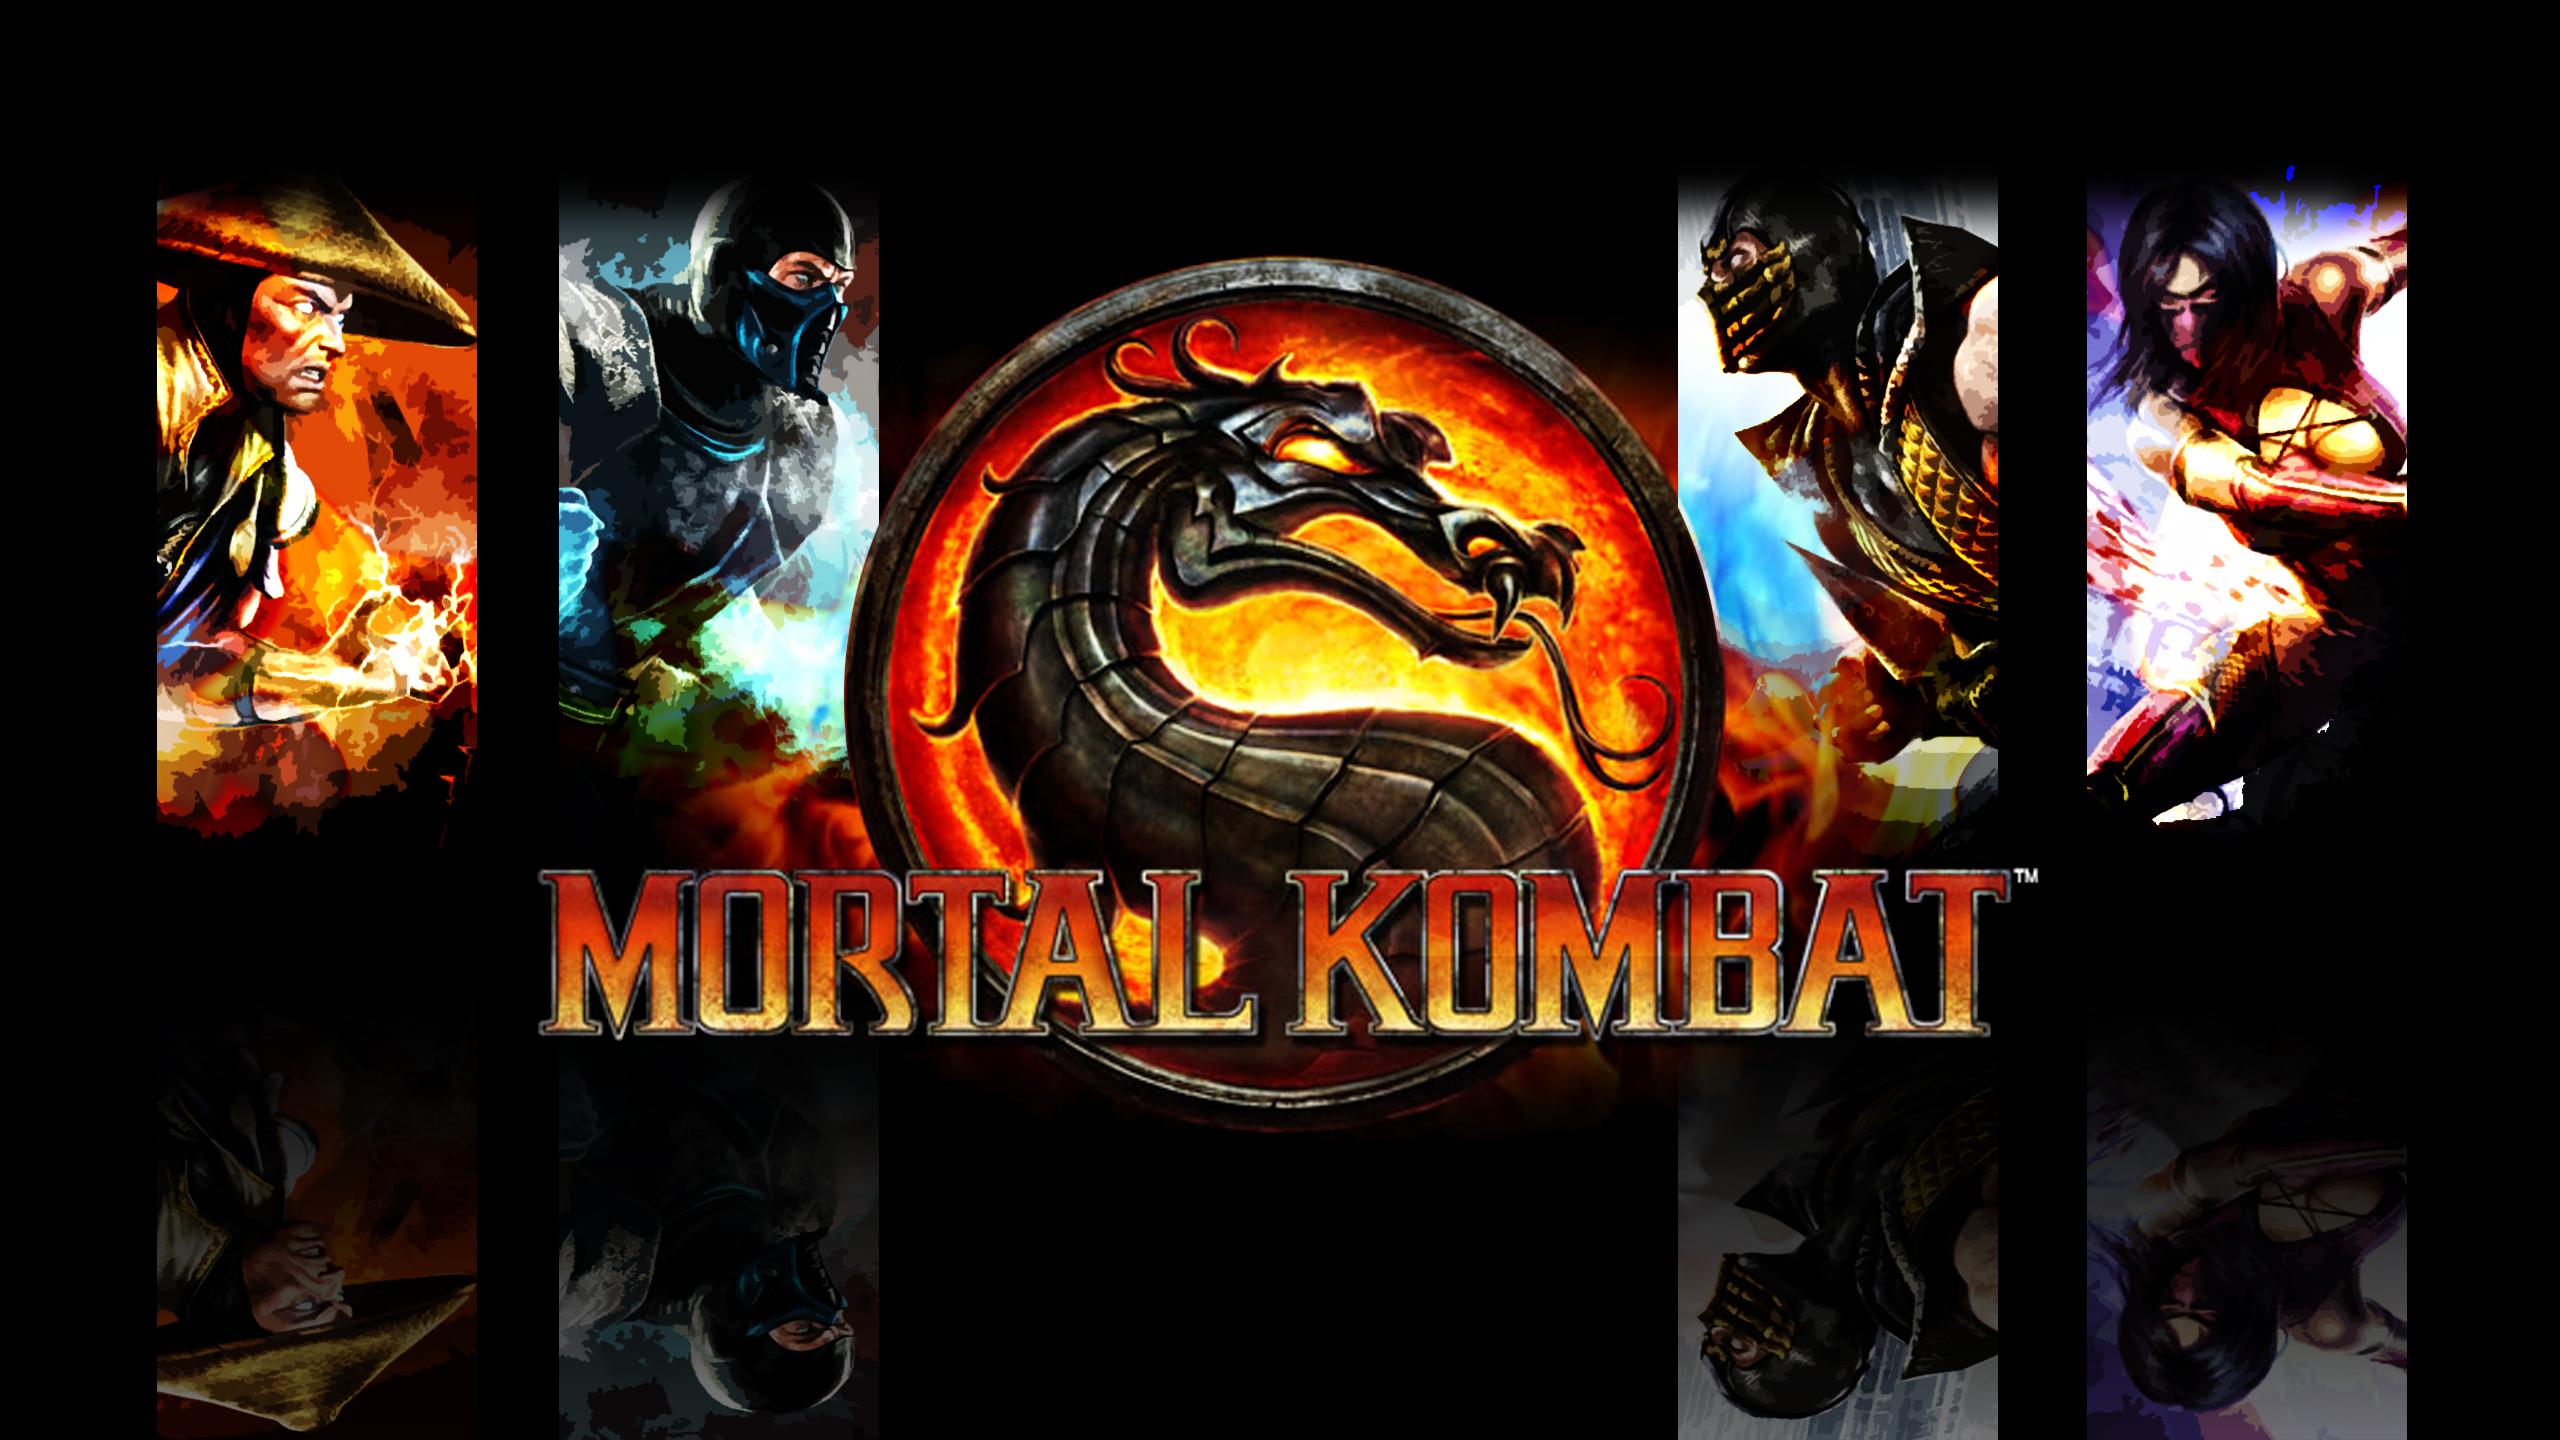 Mortal Kombat Wallpaper 6899299 2560x1440